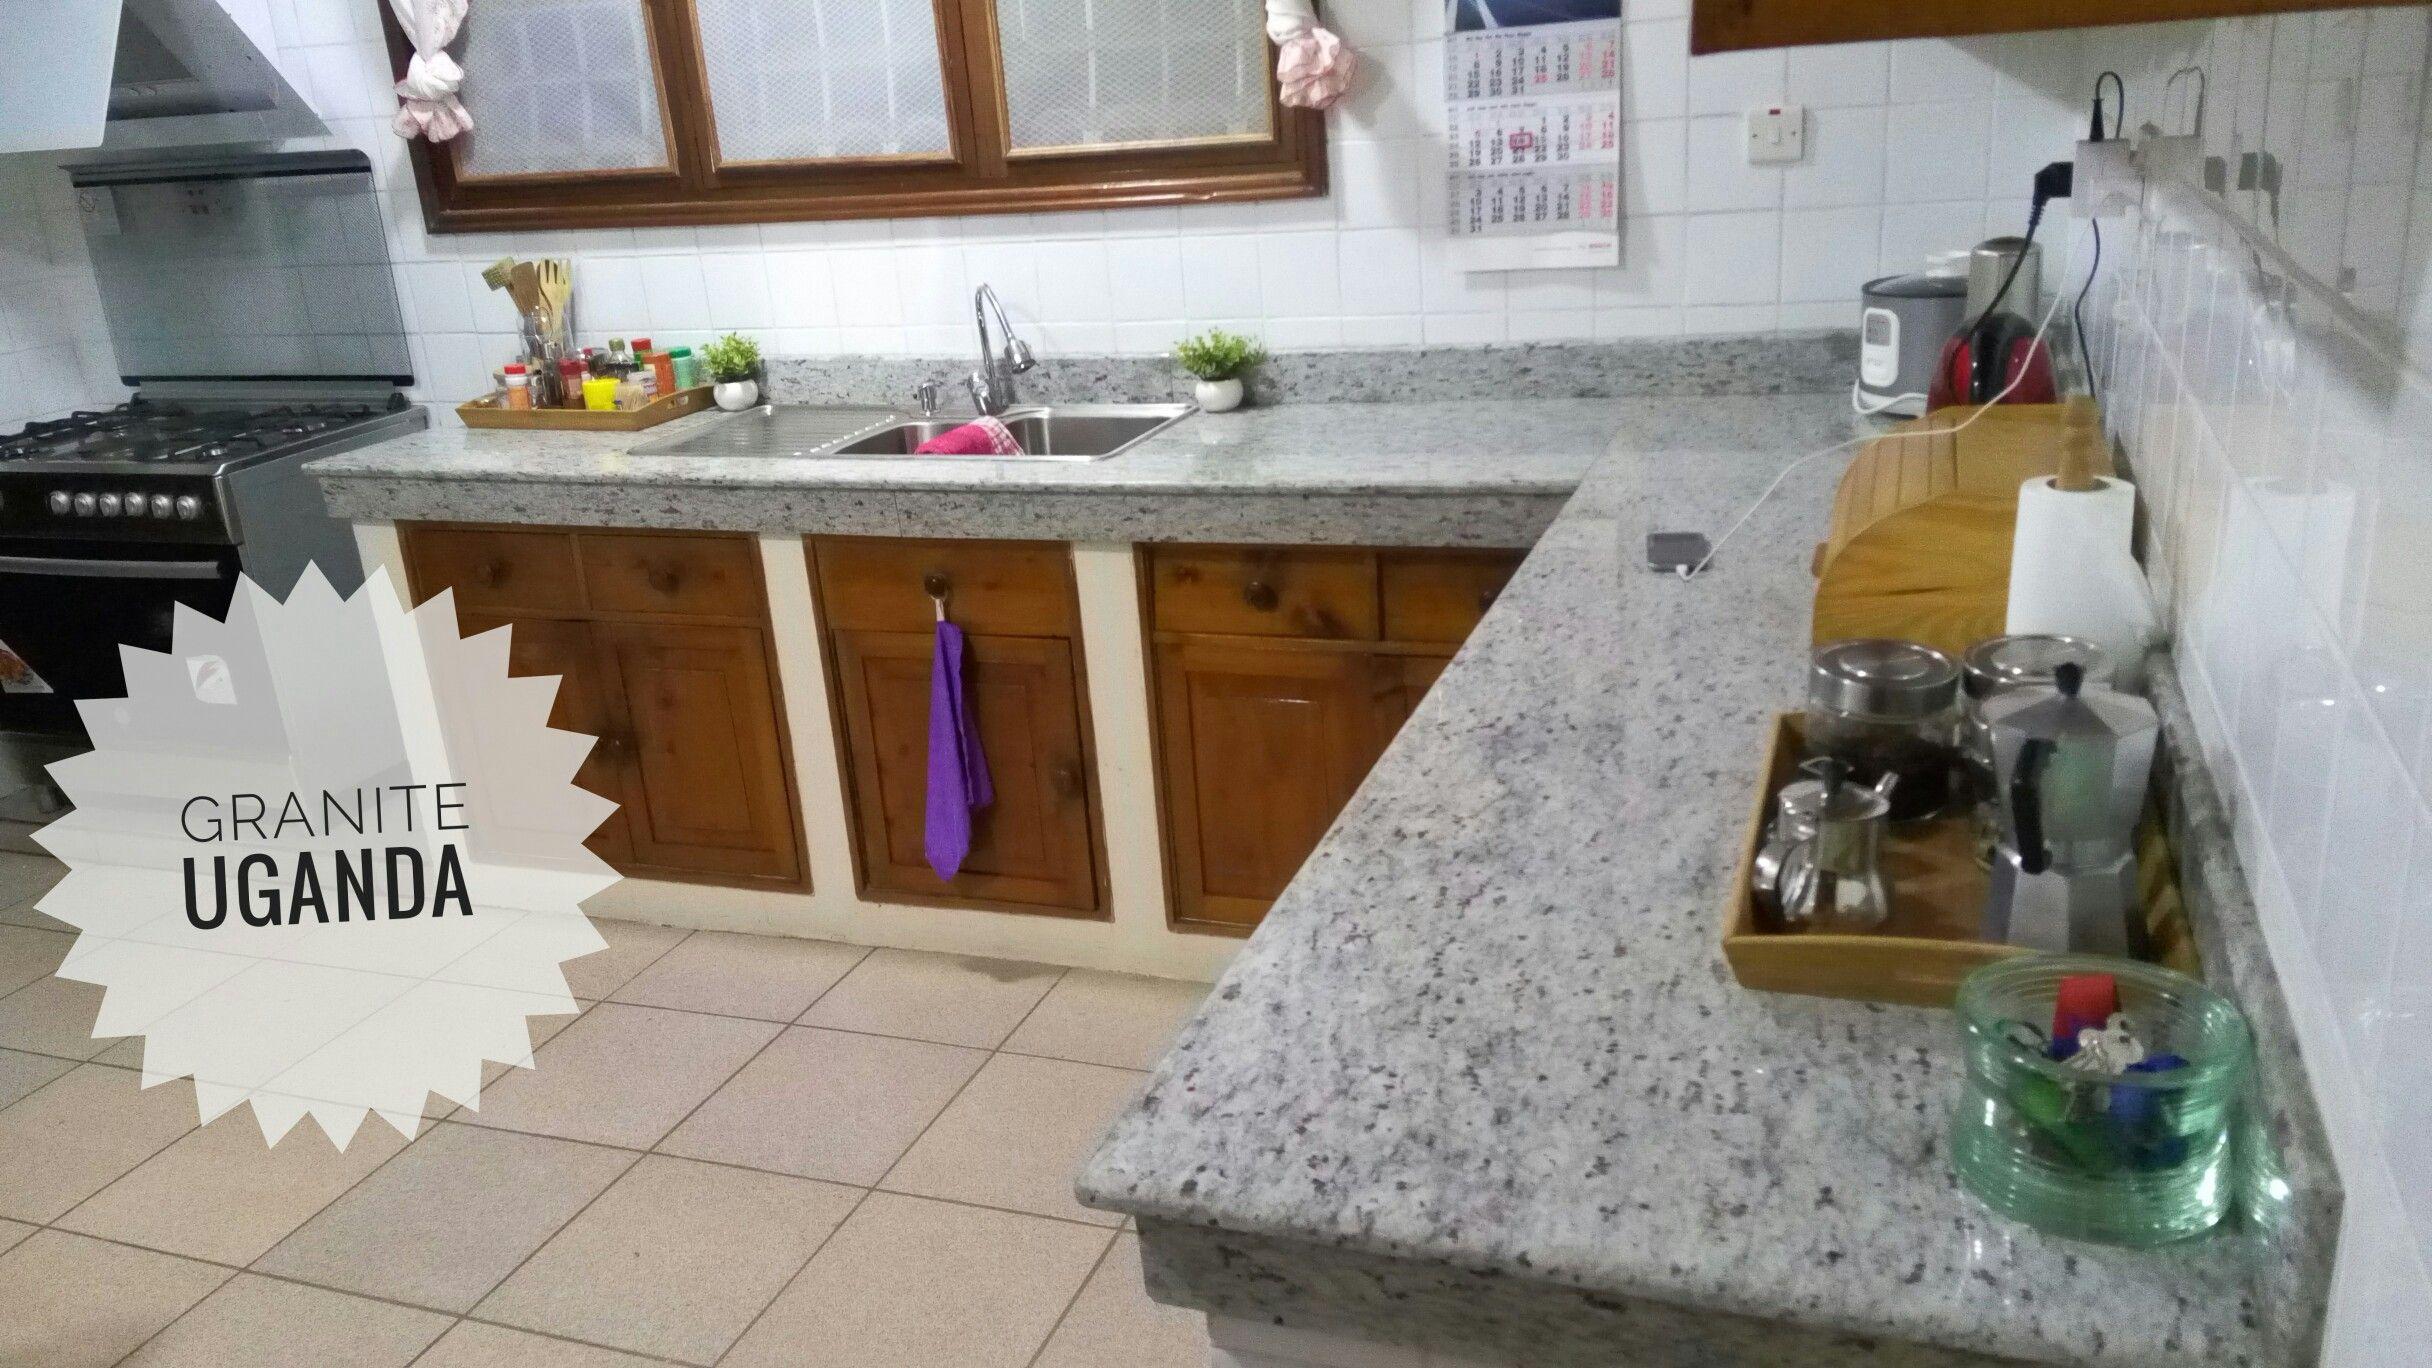 Pin By Granite Uganda On Kitchen Countertops Kitchen Countertops Kitchen Countertops